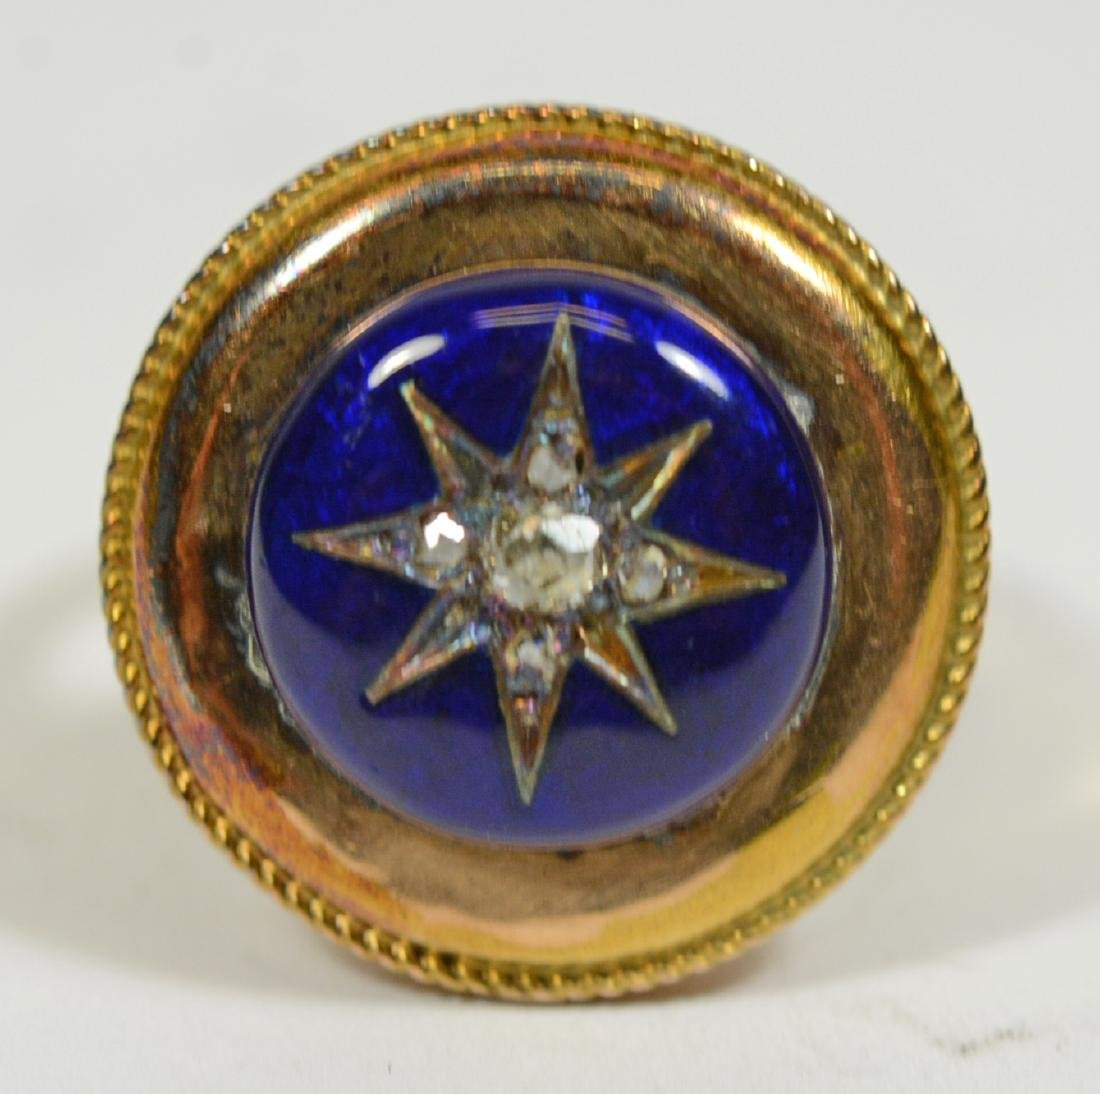 Yellow Gold Blue Enamel Center Star Ring